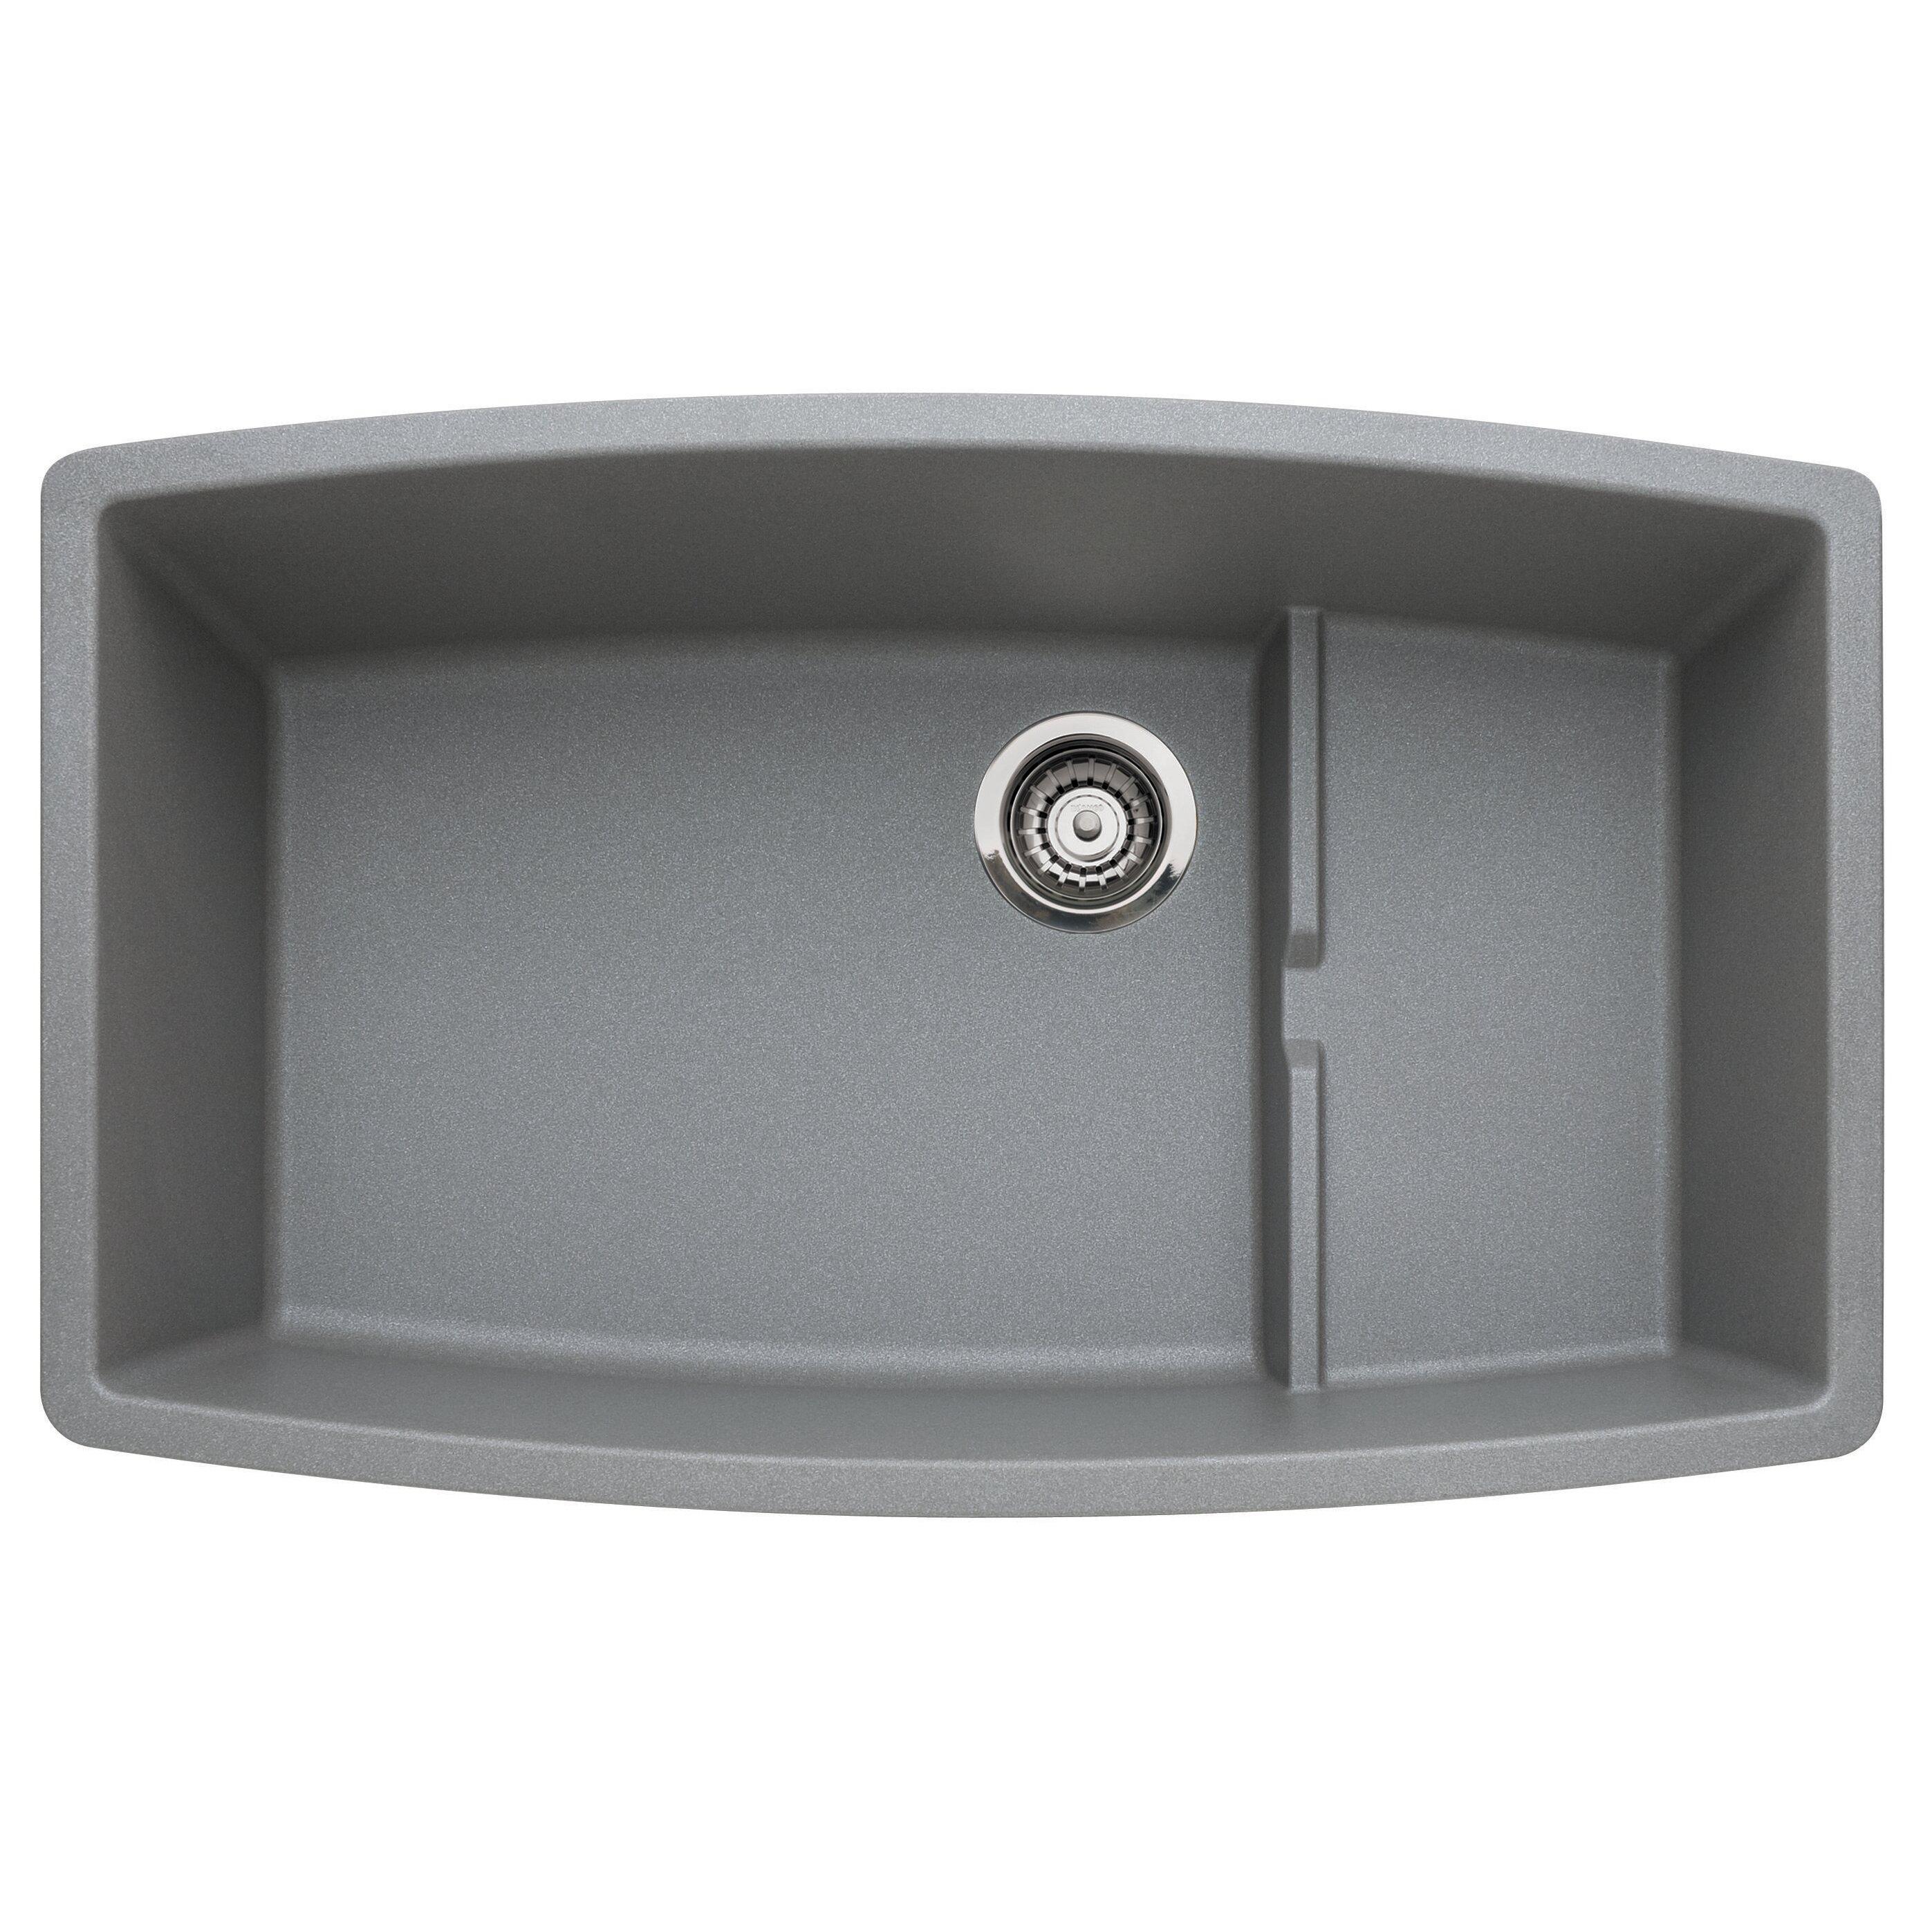 Blanco Kitchen Faucet Reviews Blanco Performa 32 X 195 Cascade Kitchen Sink Reviews Wayfair